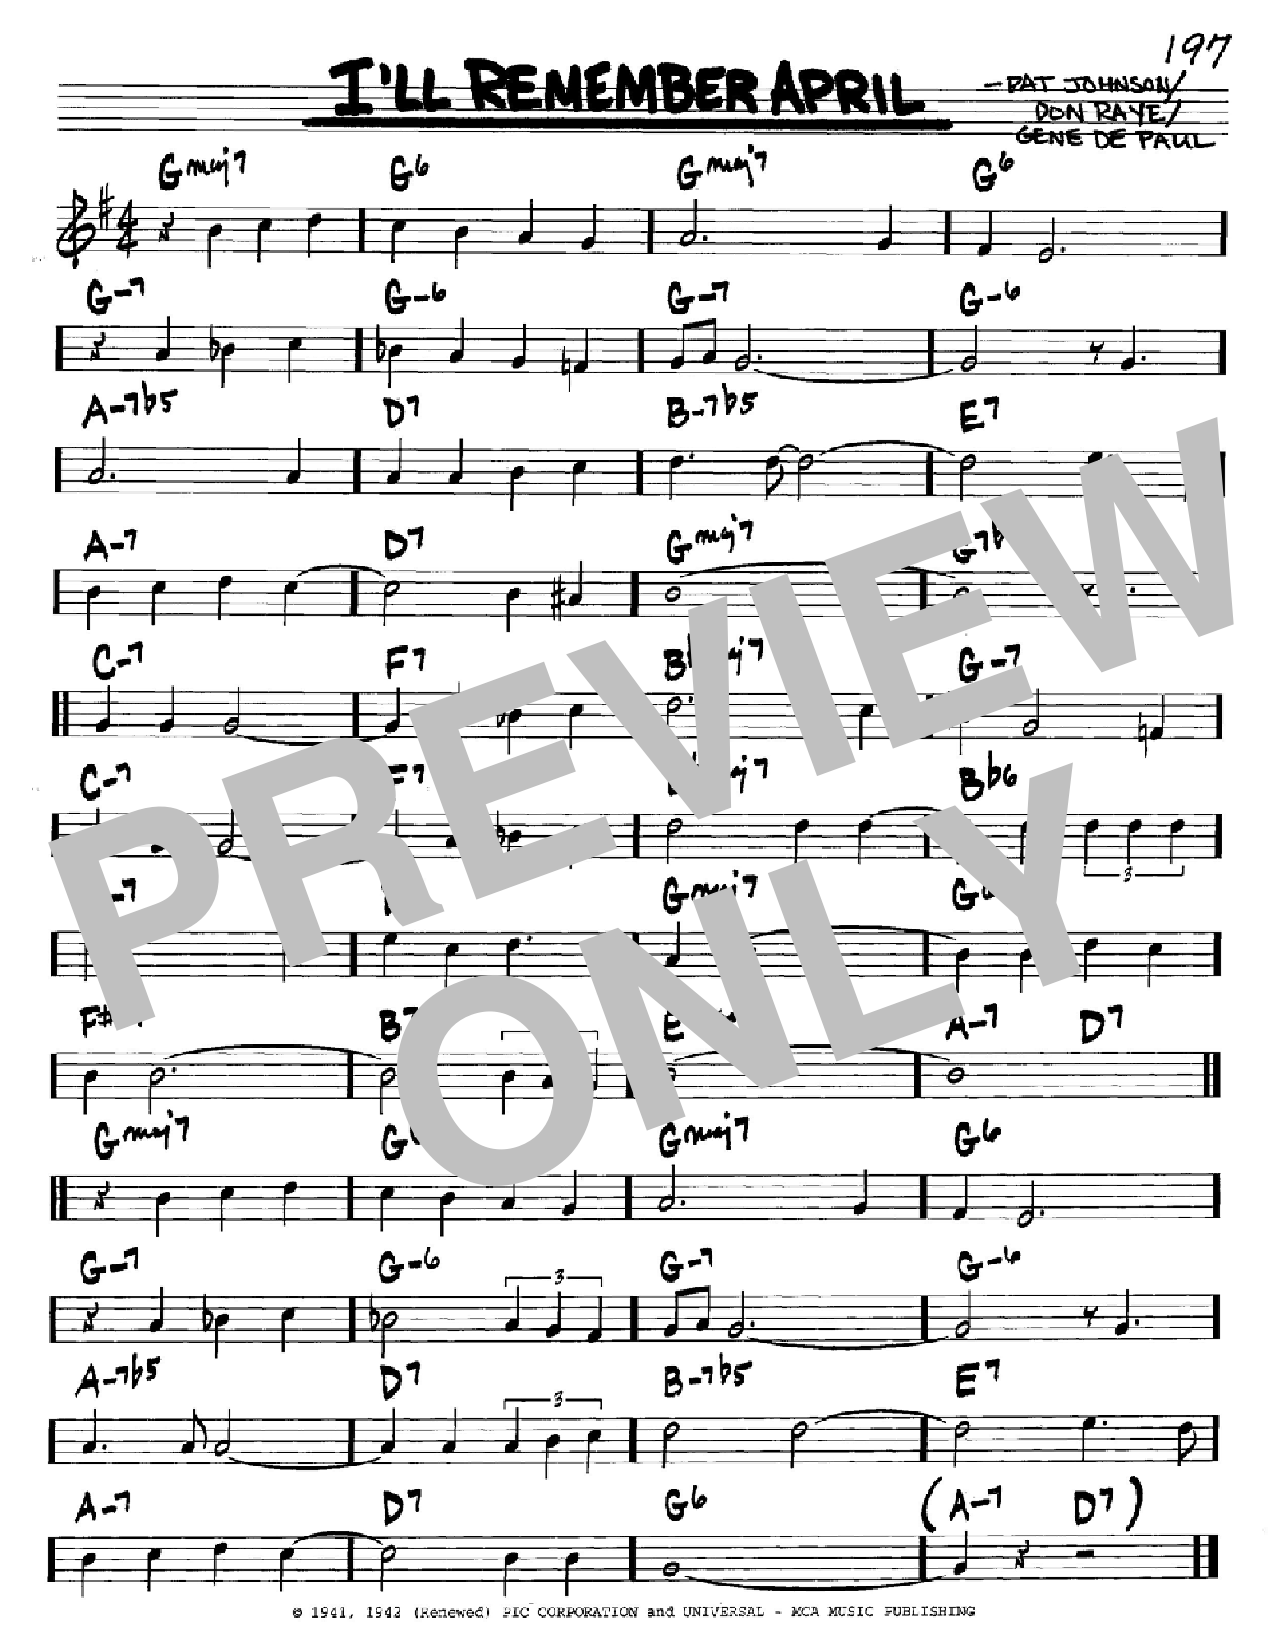 Partition autre I'll Remember April de Woody Herman - Real Book, Melodie et Accords, Inst. En Do